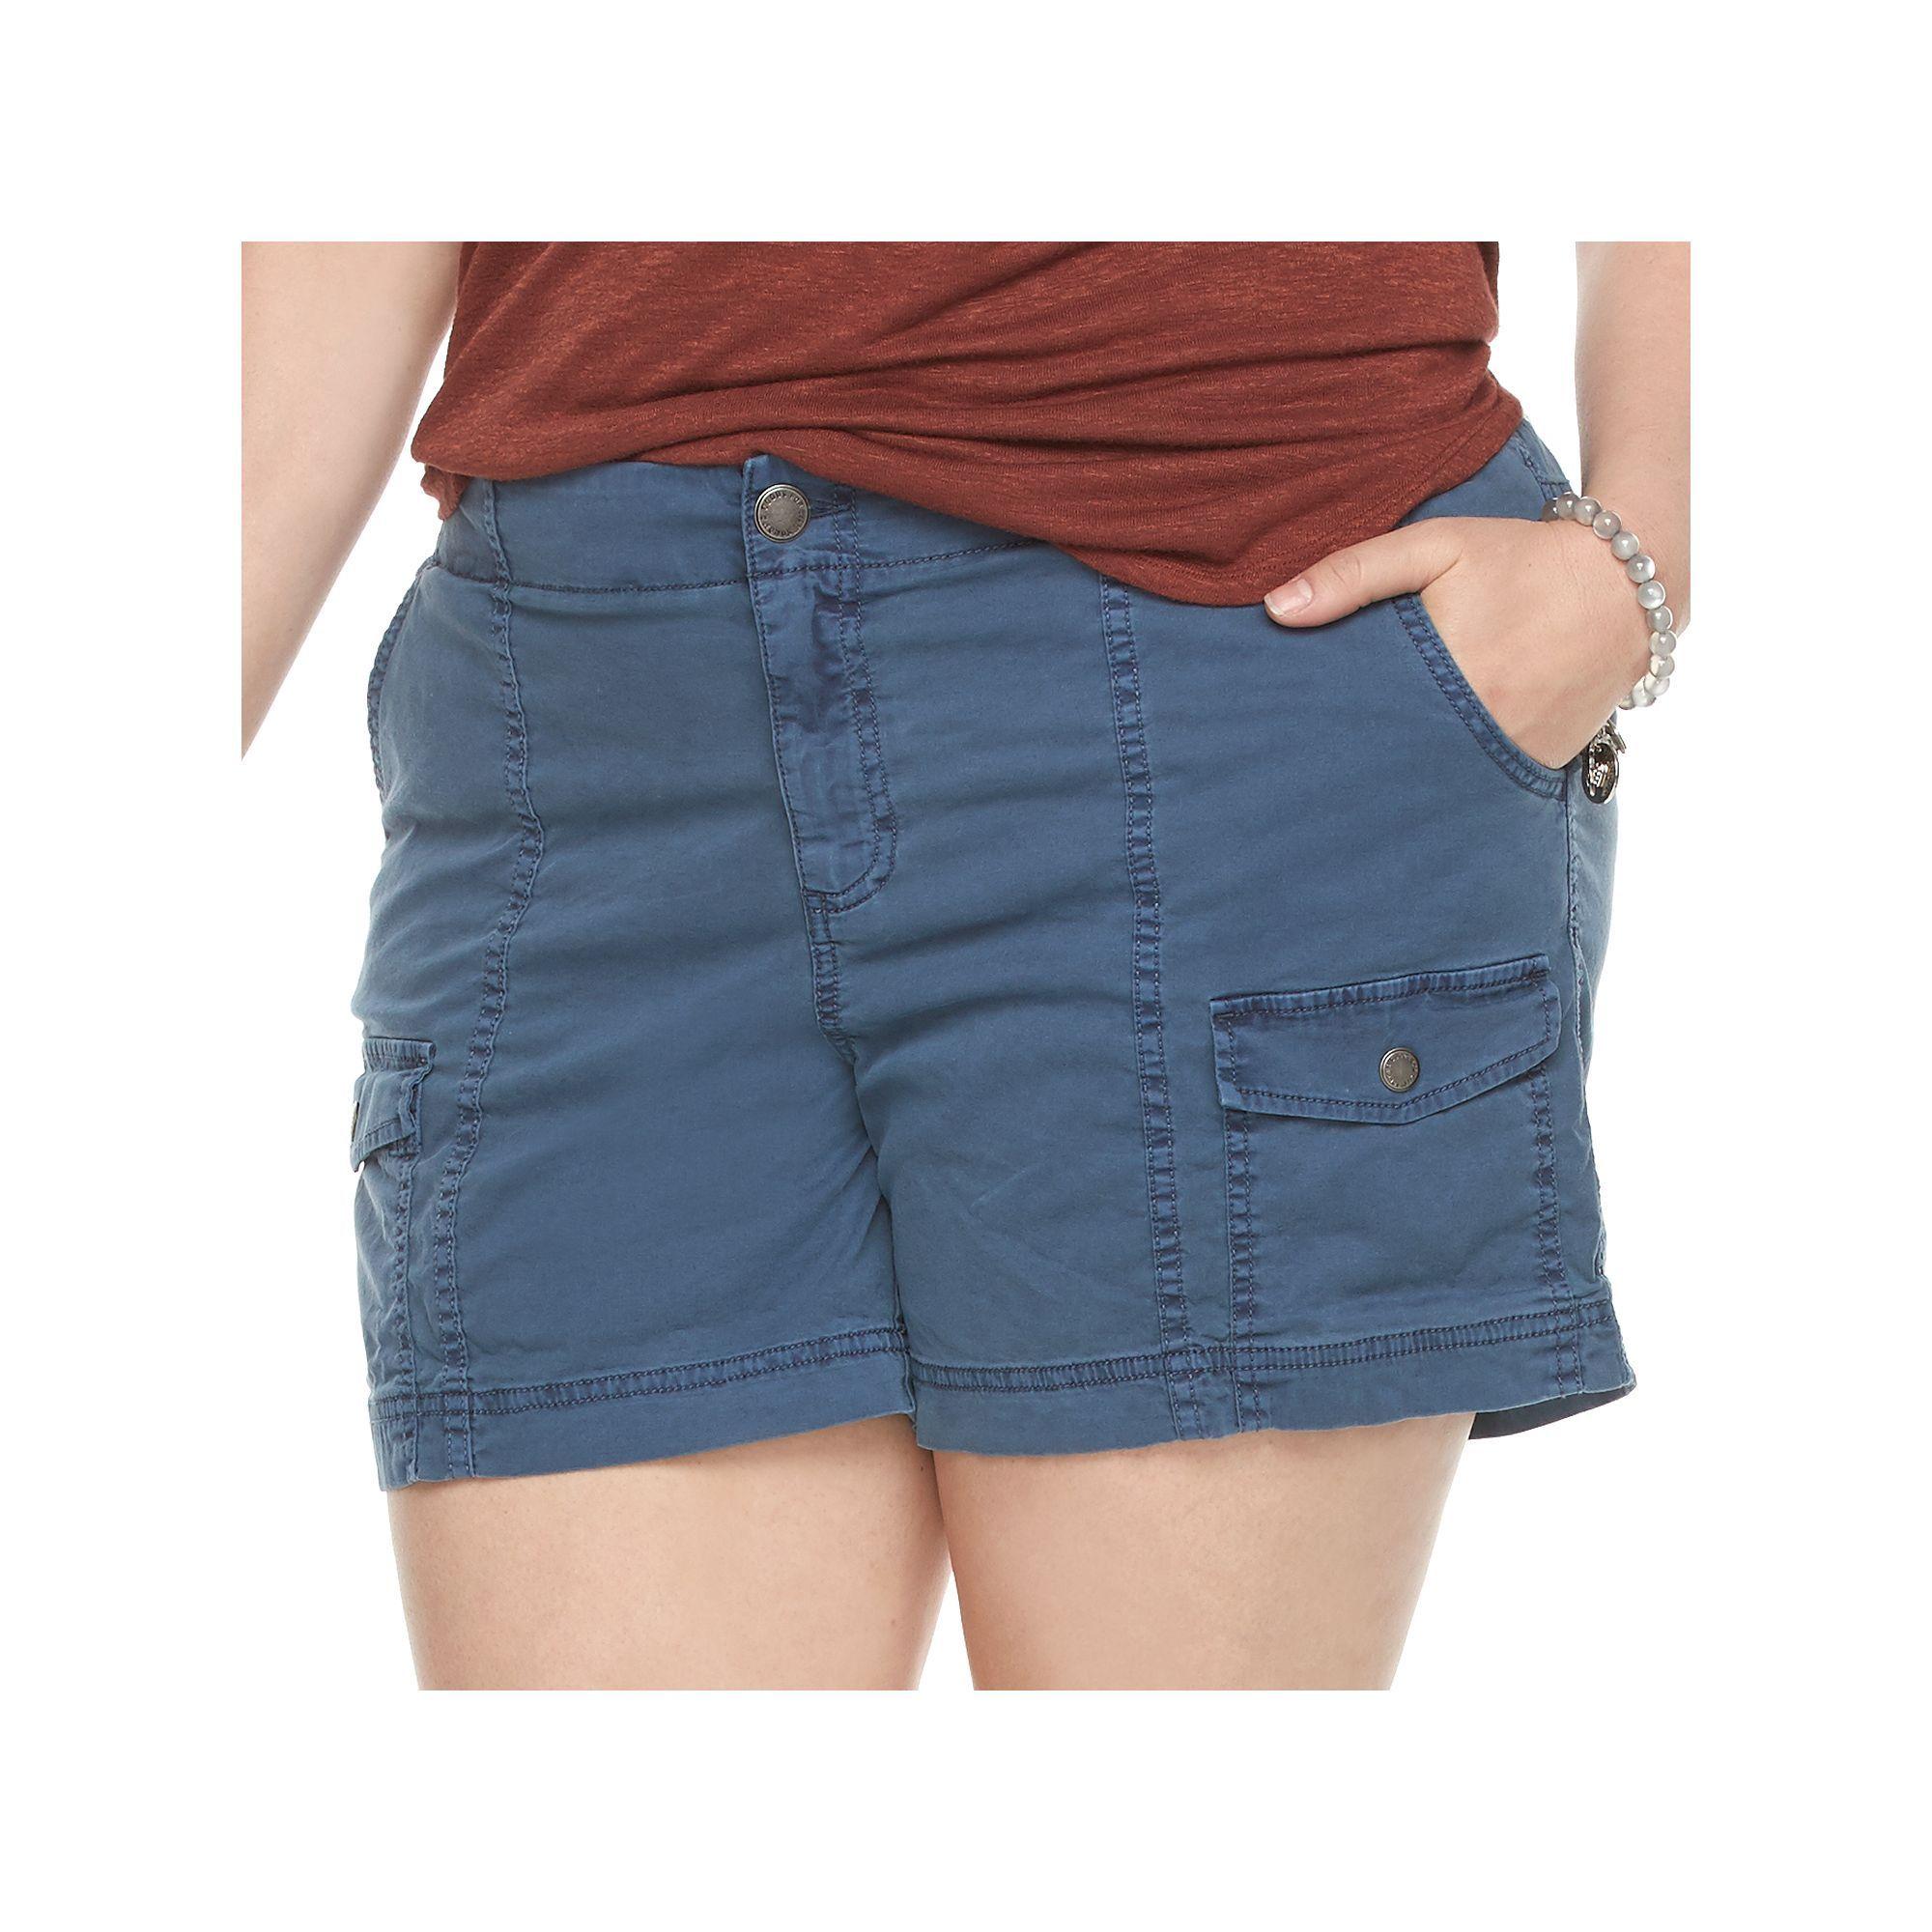 jeans nora fullscreen comfort comforter view lyst denim sky clothing skinny jag in waist southern blue